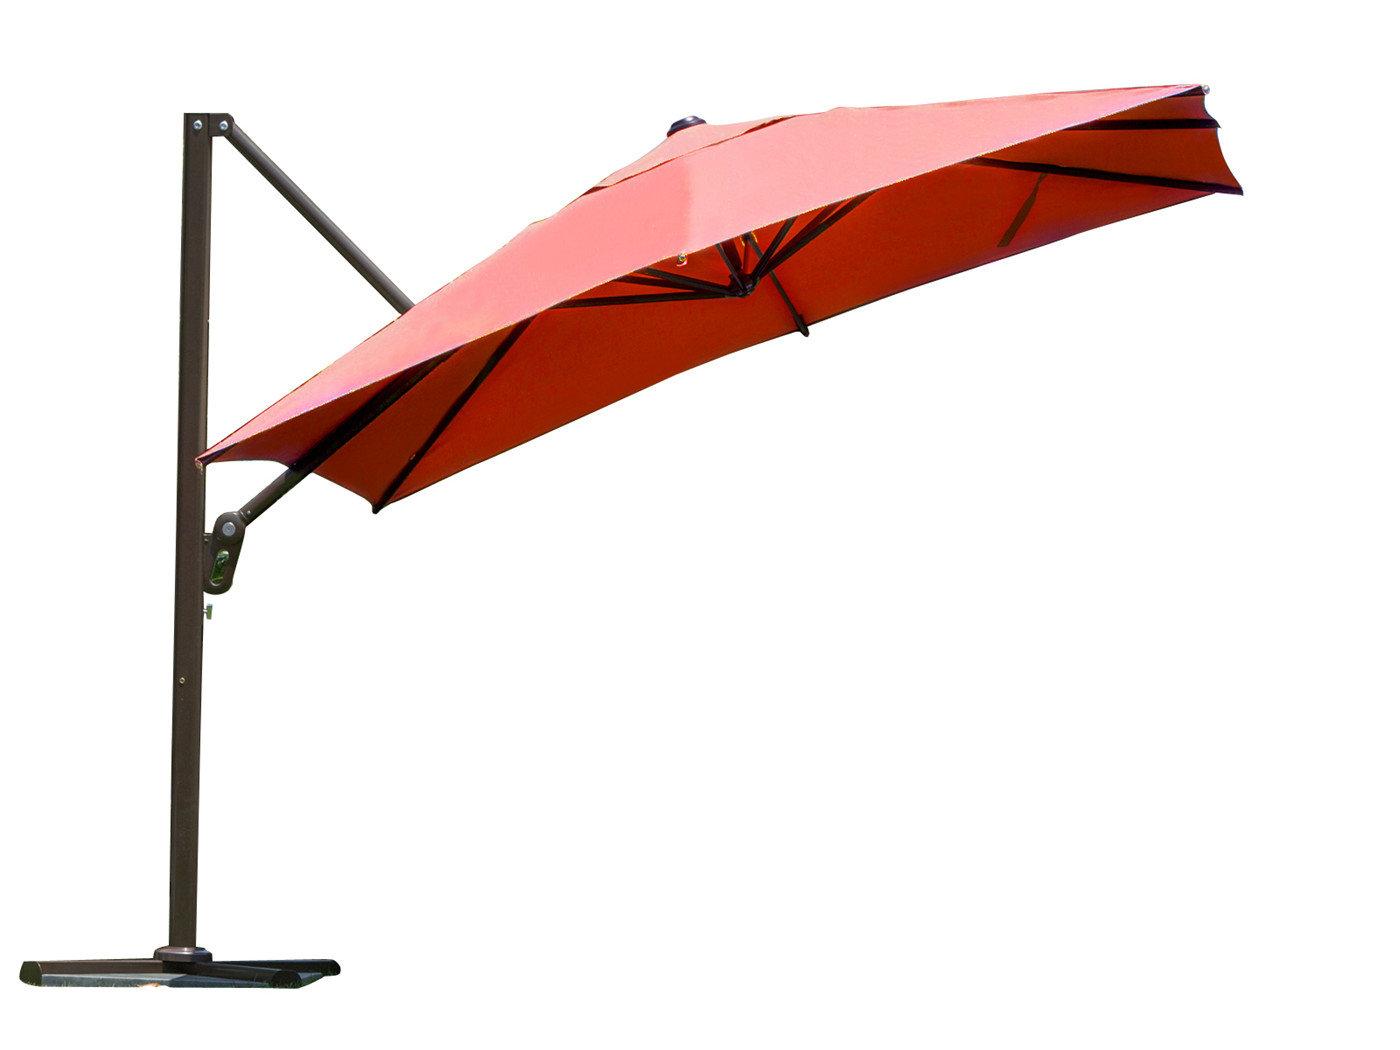 Maidste Square Cantilever Umbrellas For Newest 9' Square Cantilever Umbrella (View 10 of 20)